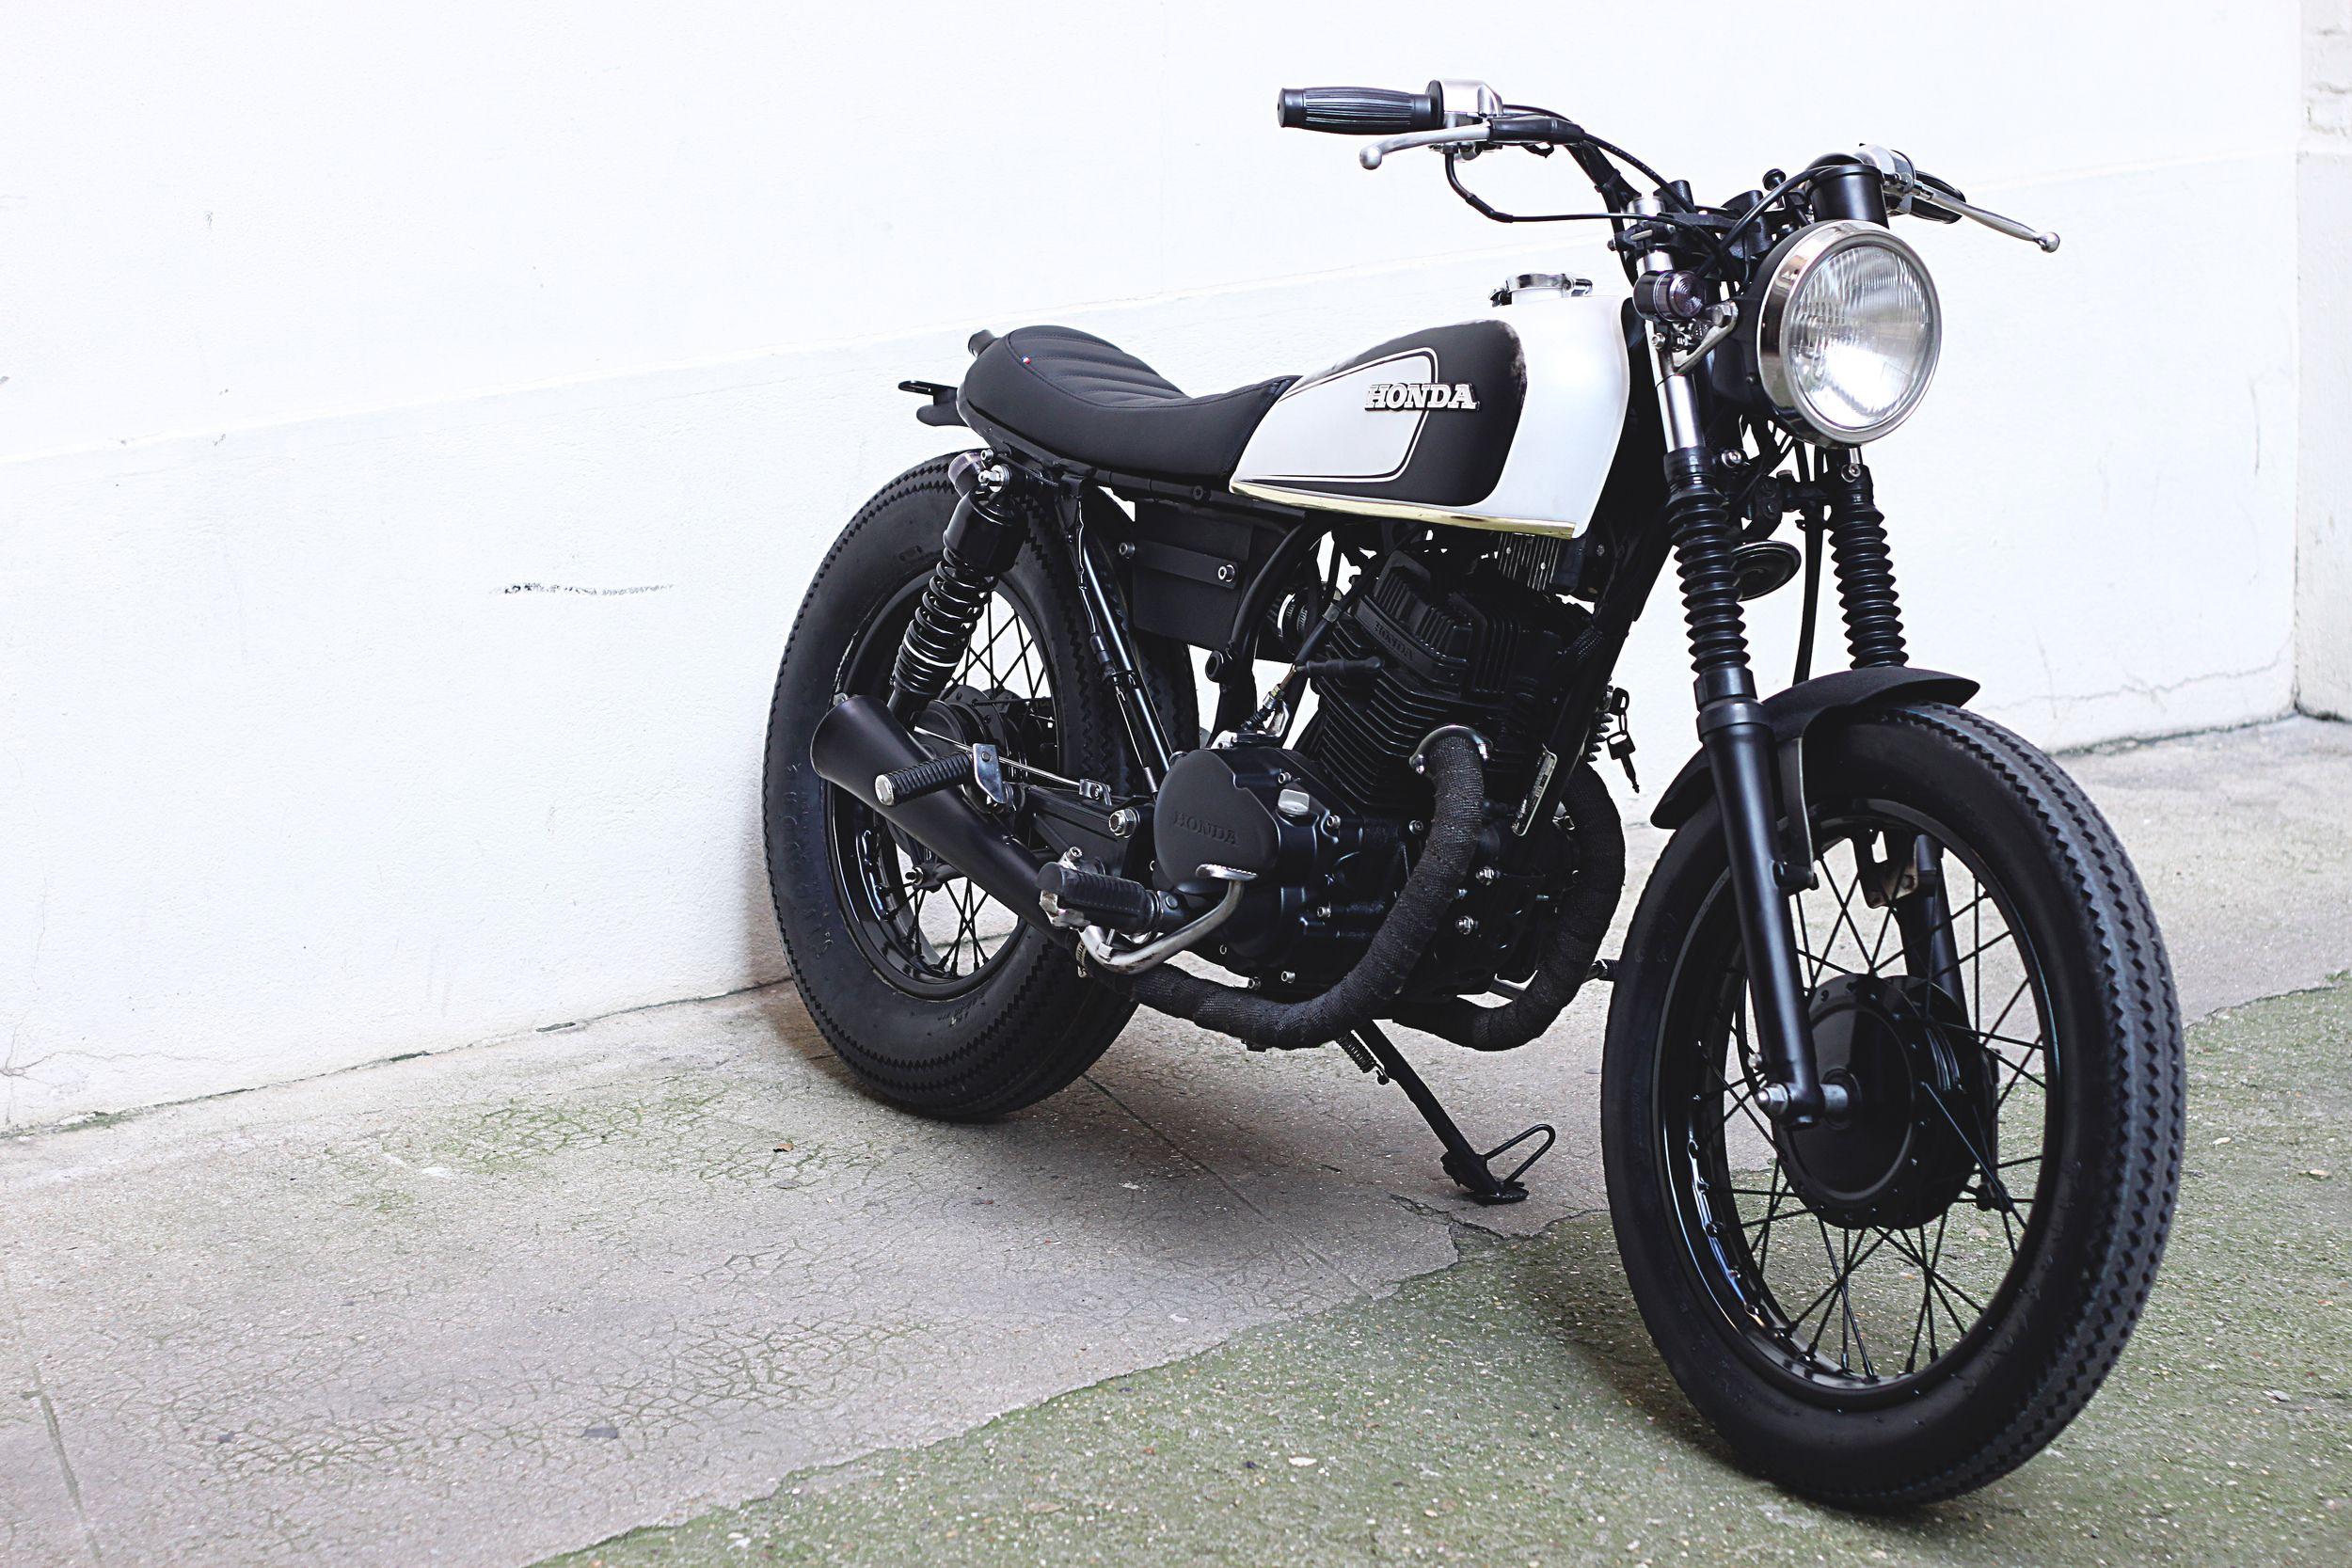 hm cmc 125 dauphine lamarck honda cm pinterest roue enduro et moto. Black Bedroom Furniture Sets. Home Design Ideas